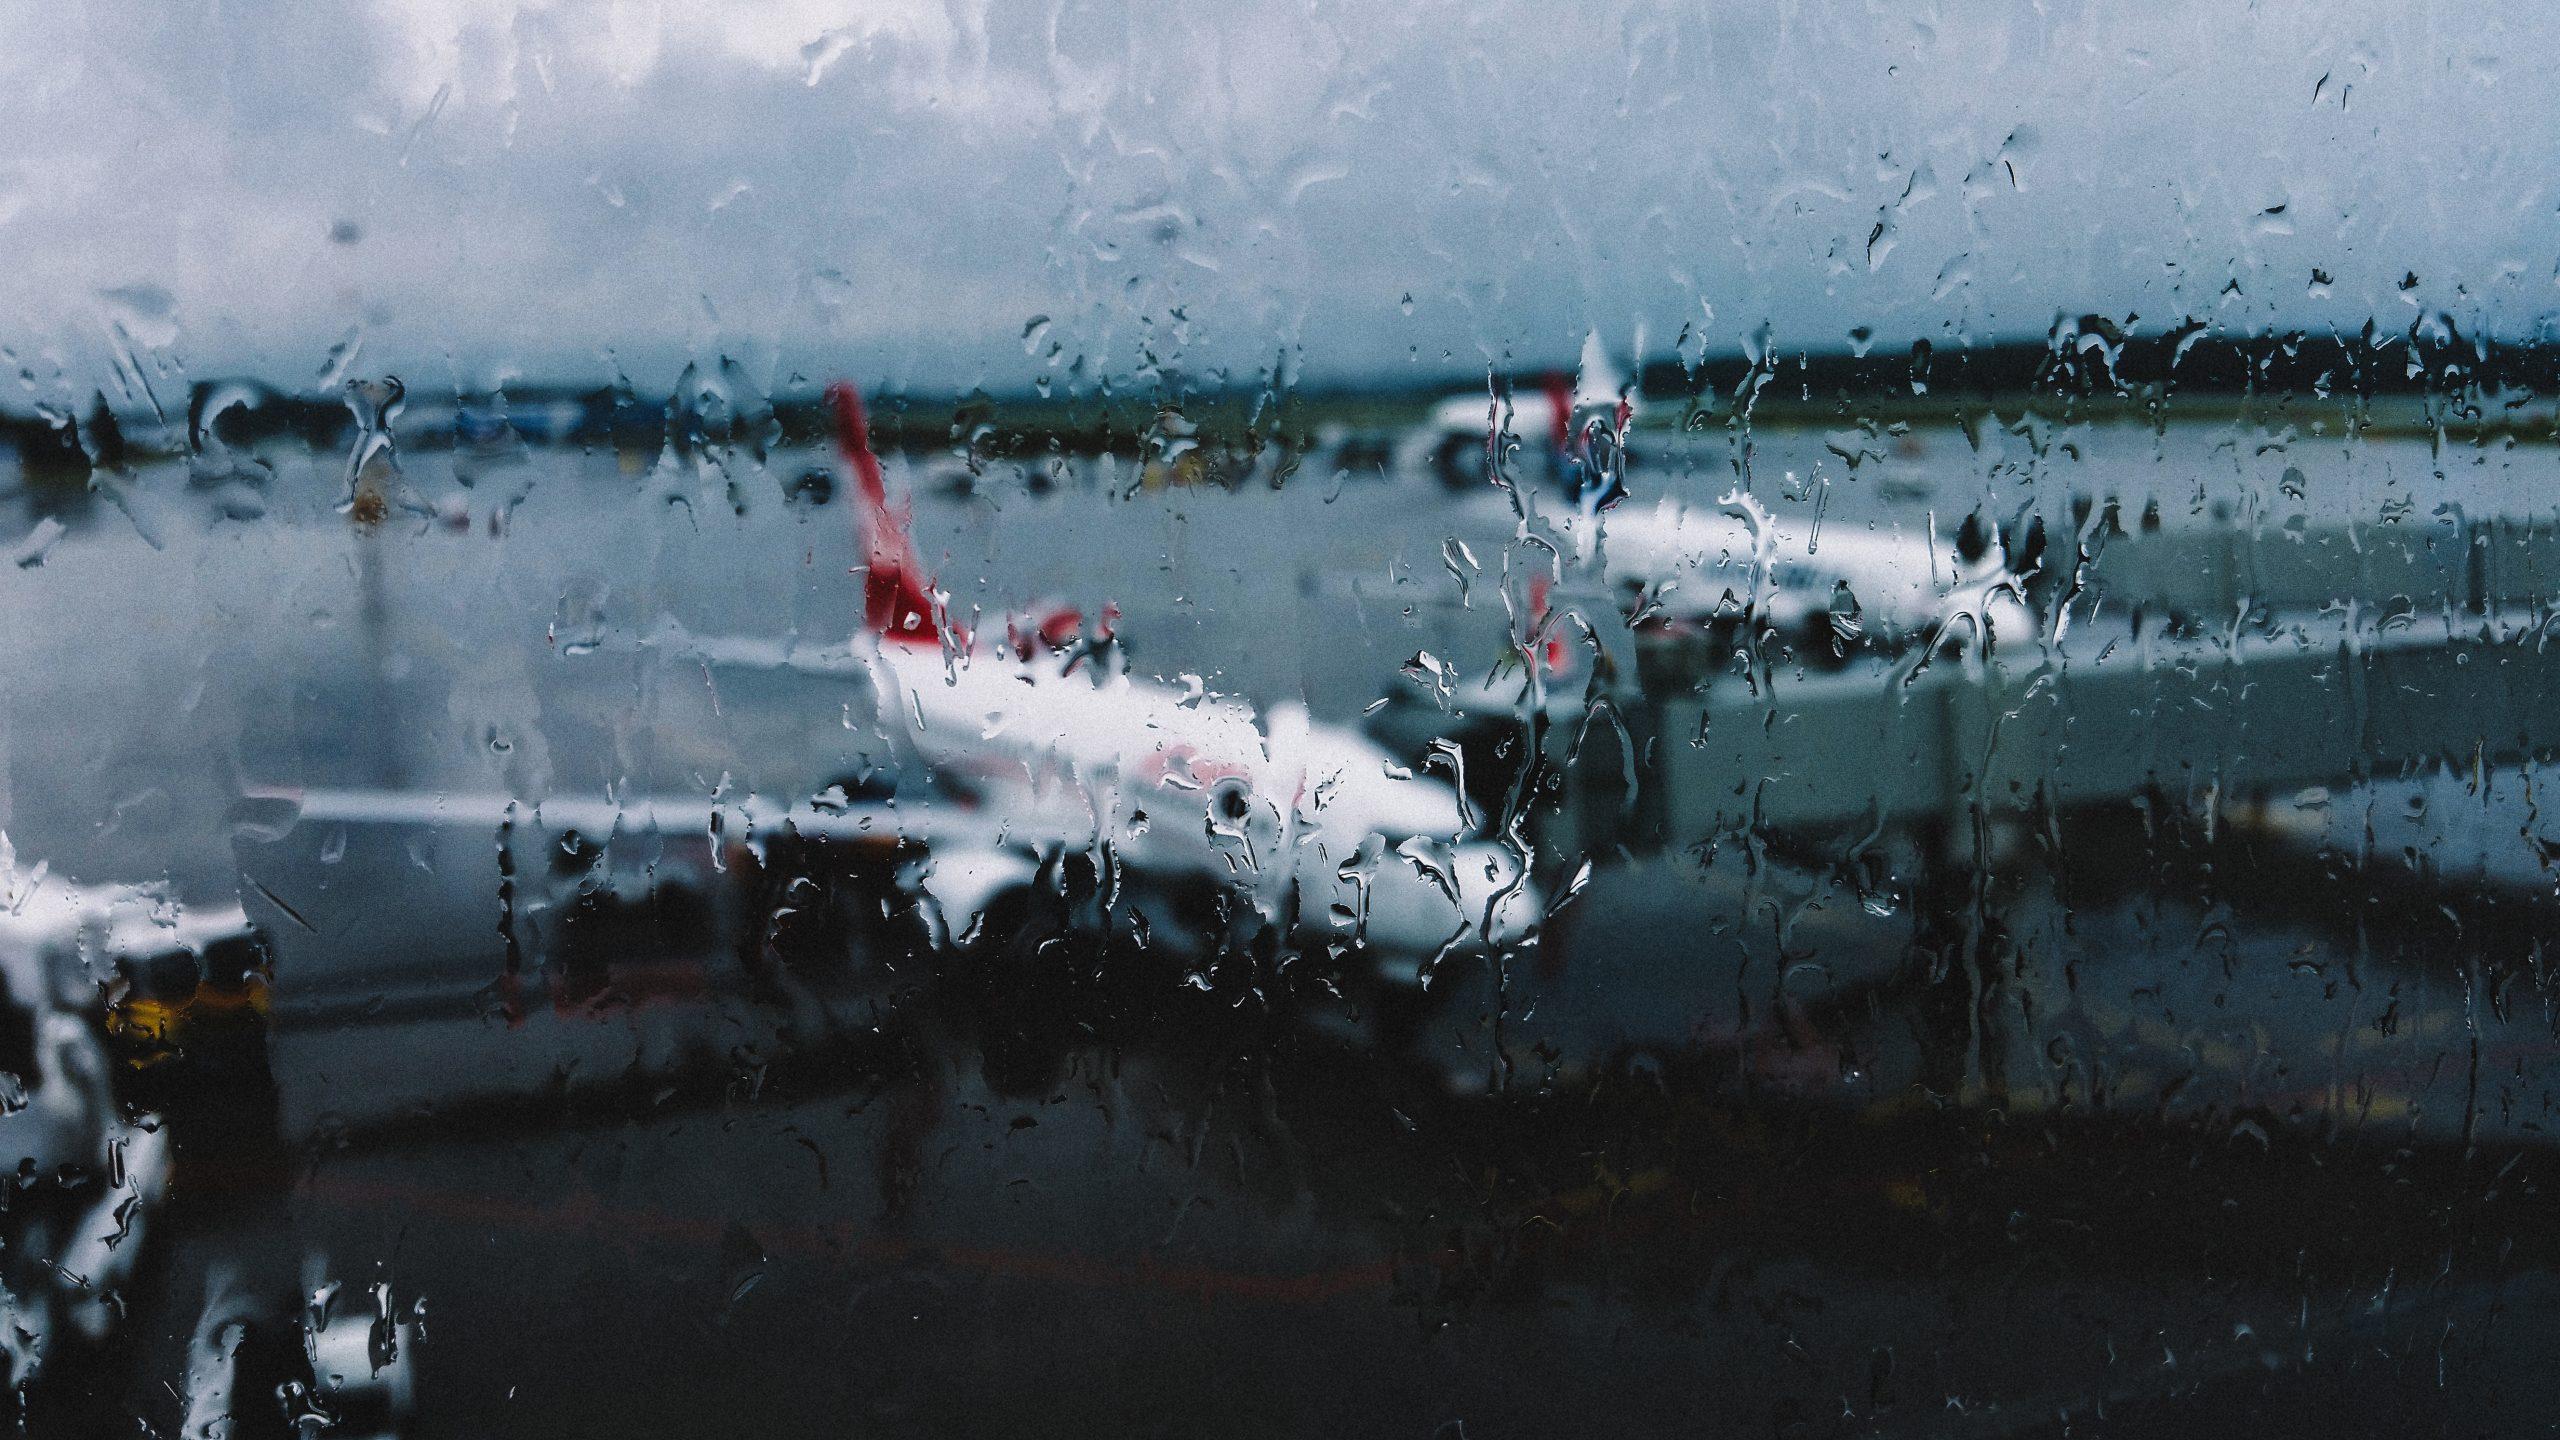 Rainy Airport Day